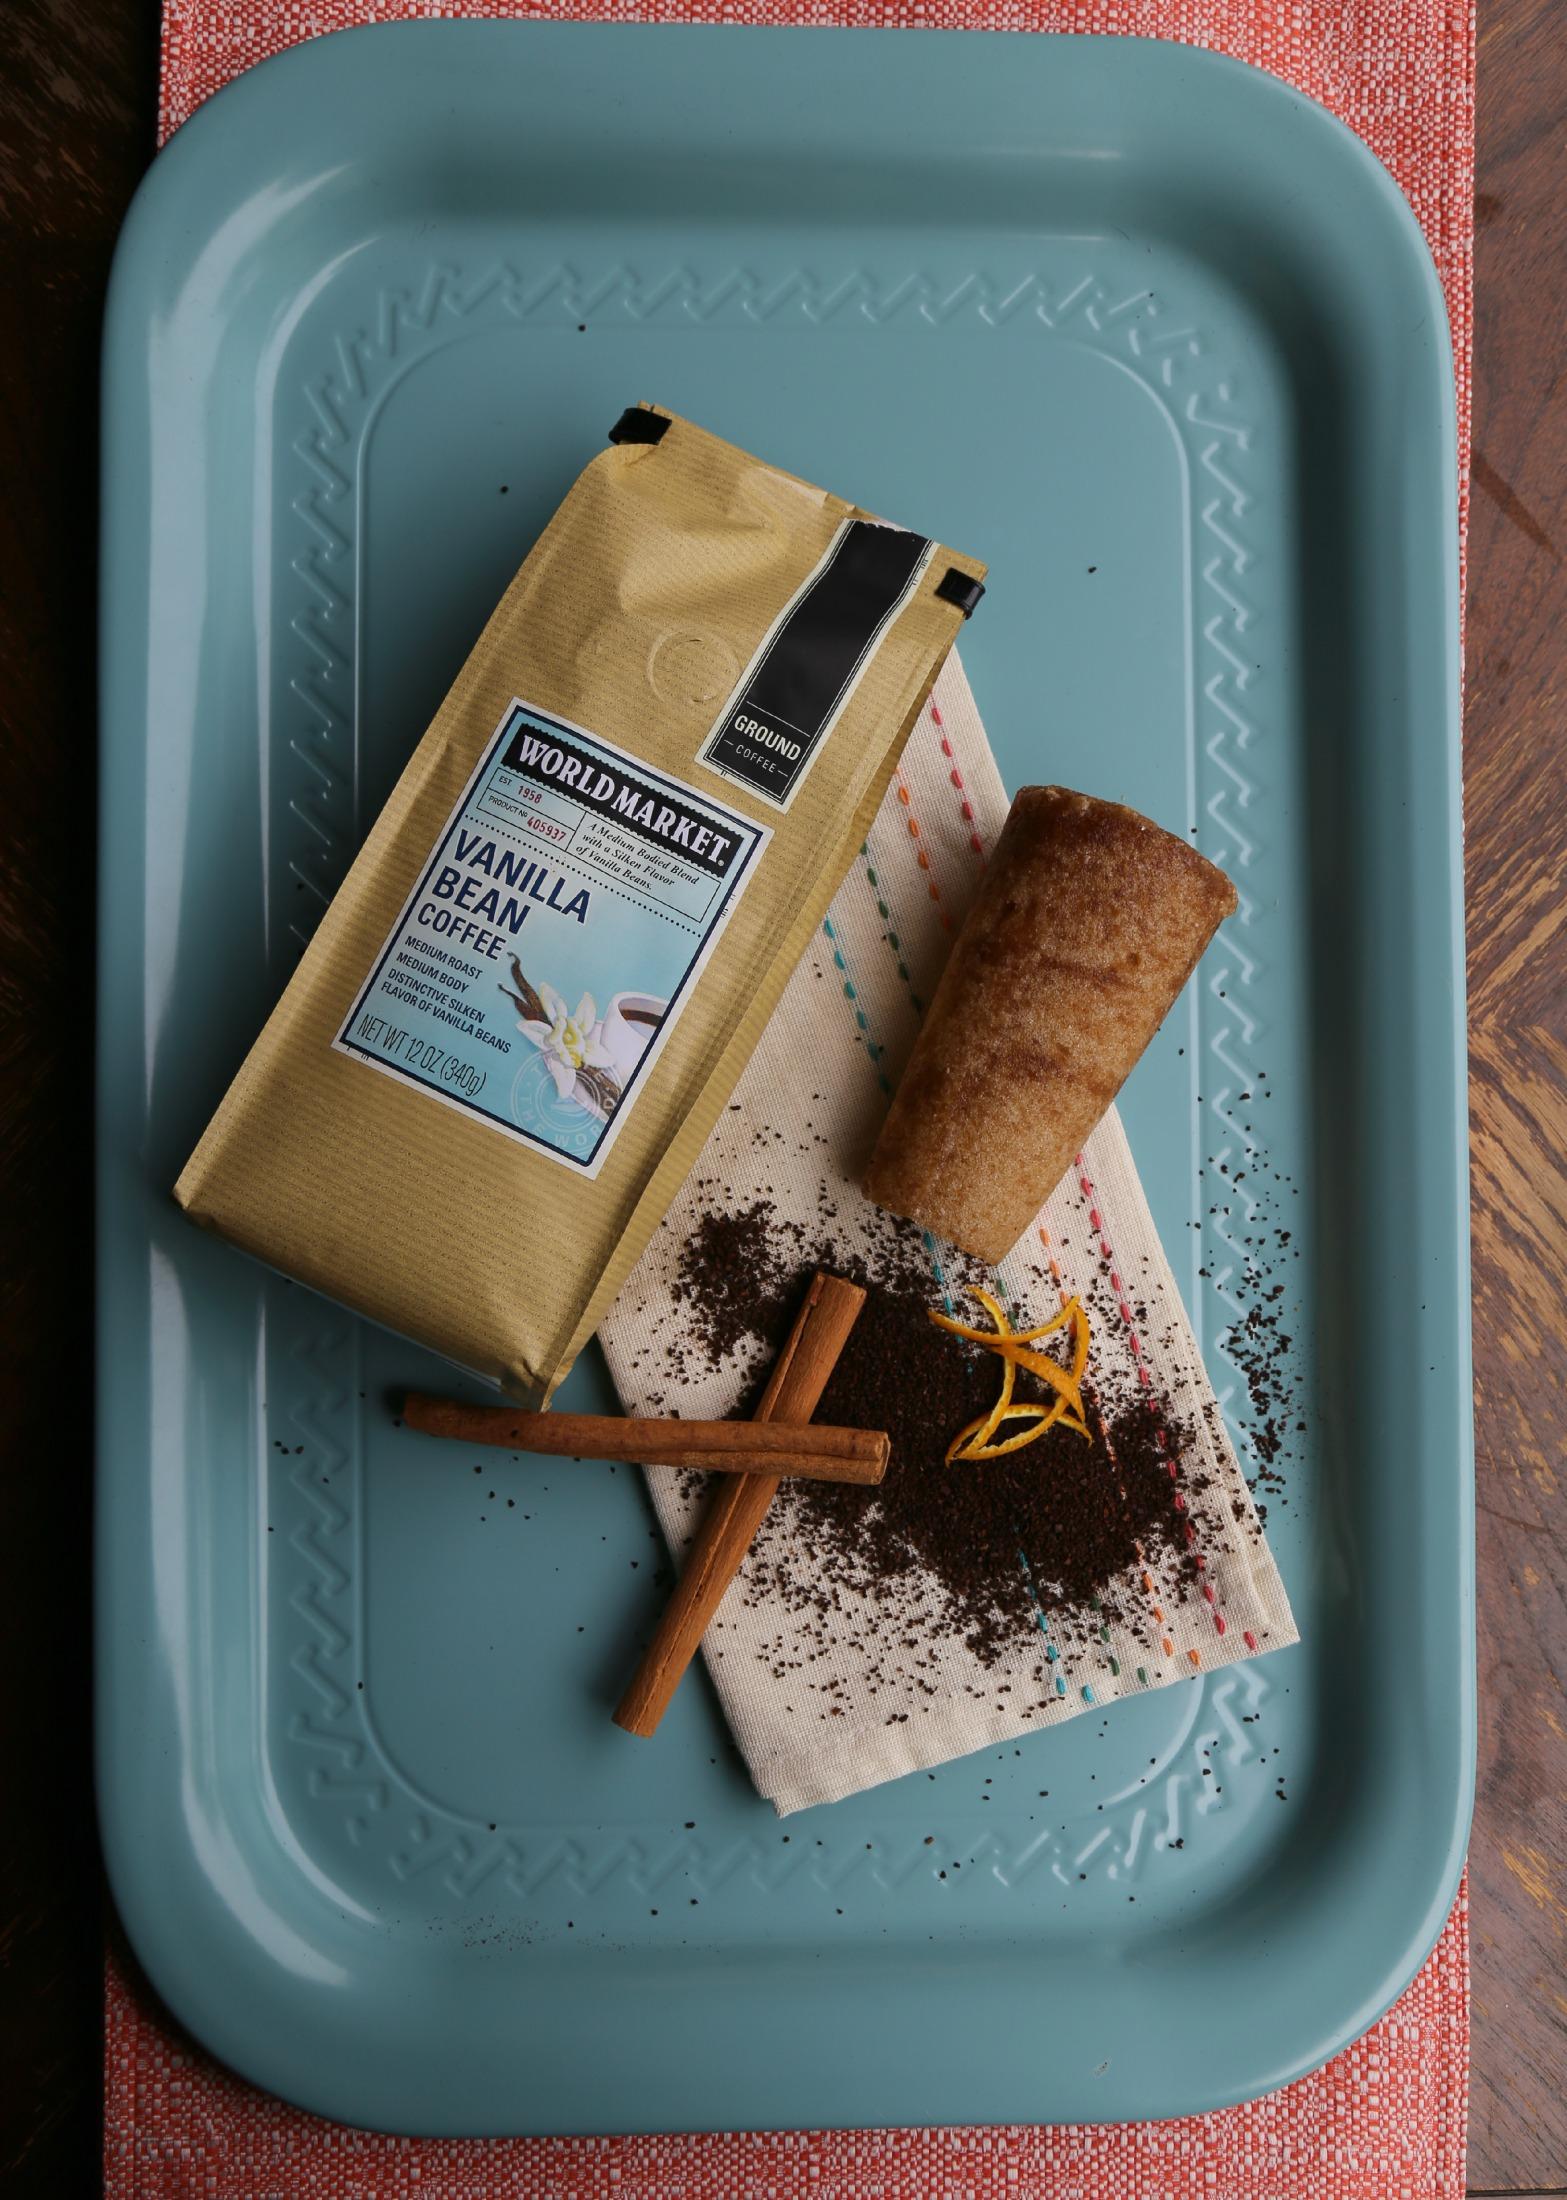 cafe-de-olla-WorldMarket-coffee-VianneyRodriguez-sweetlifebake